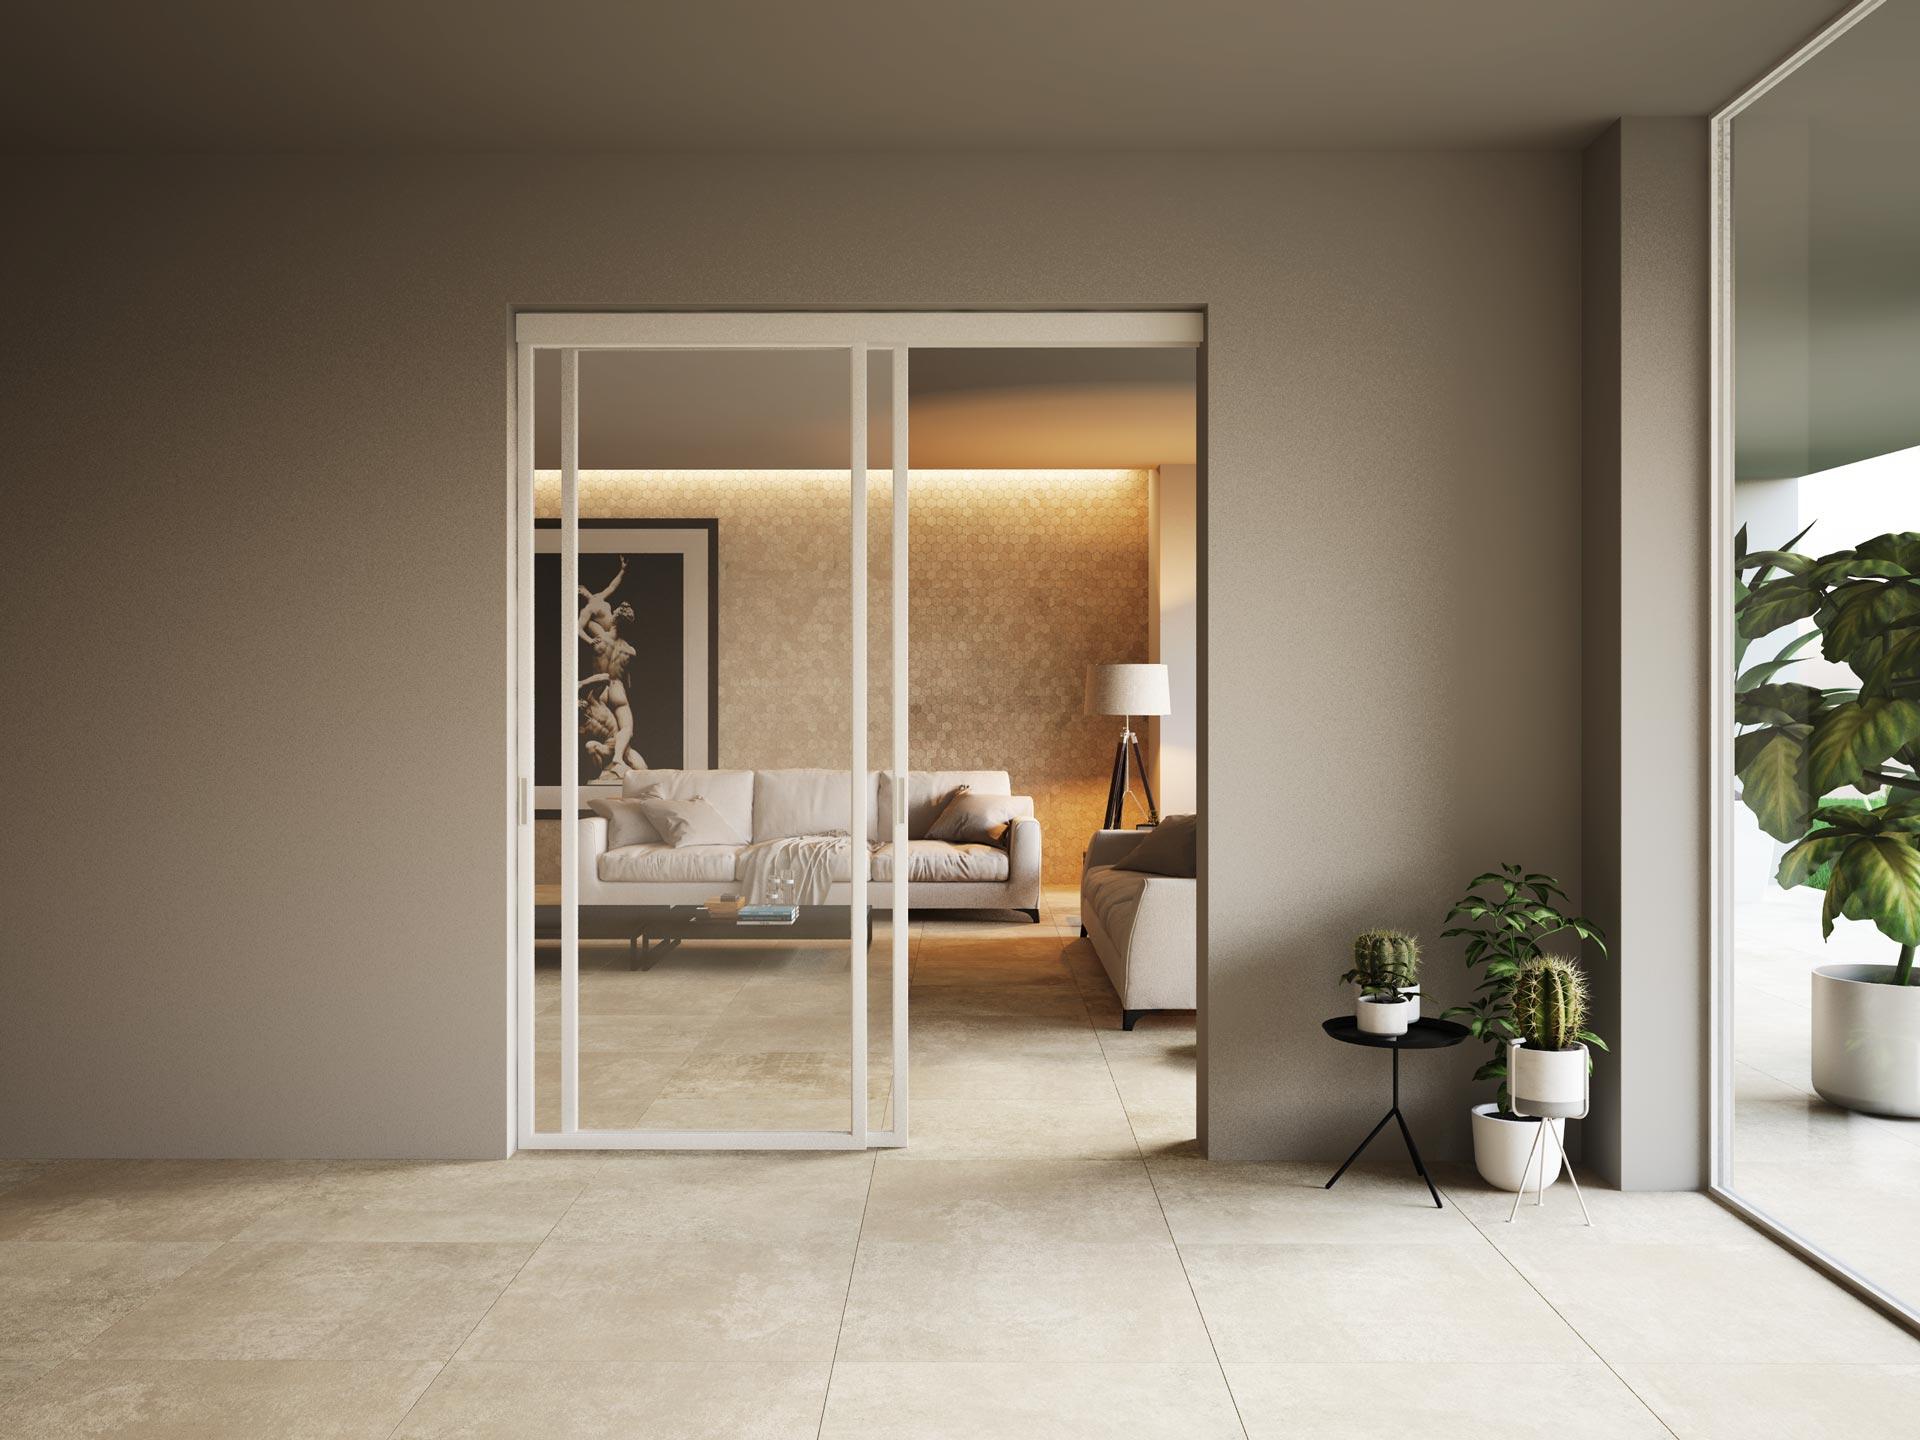 indoor-light-soggiorno20000